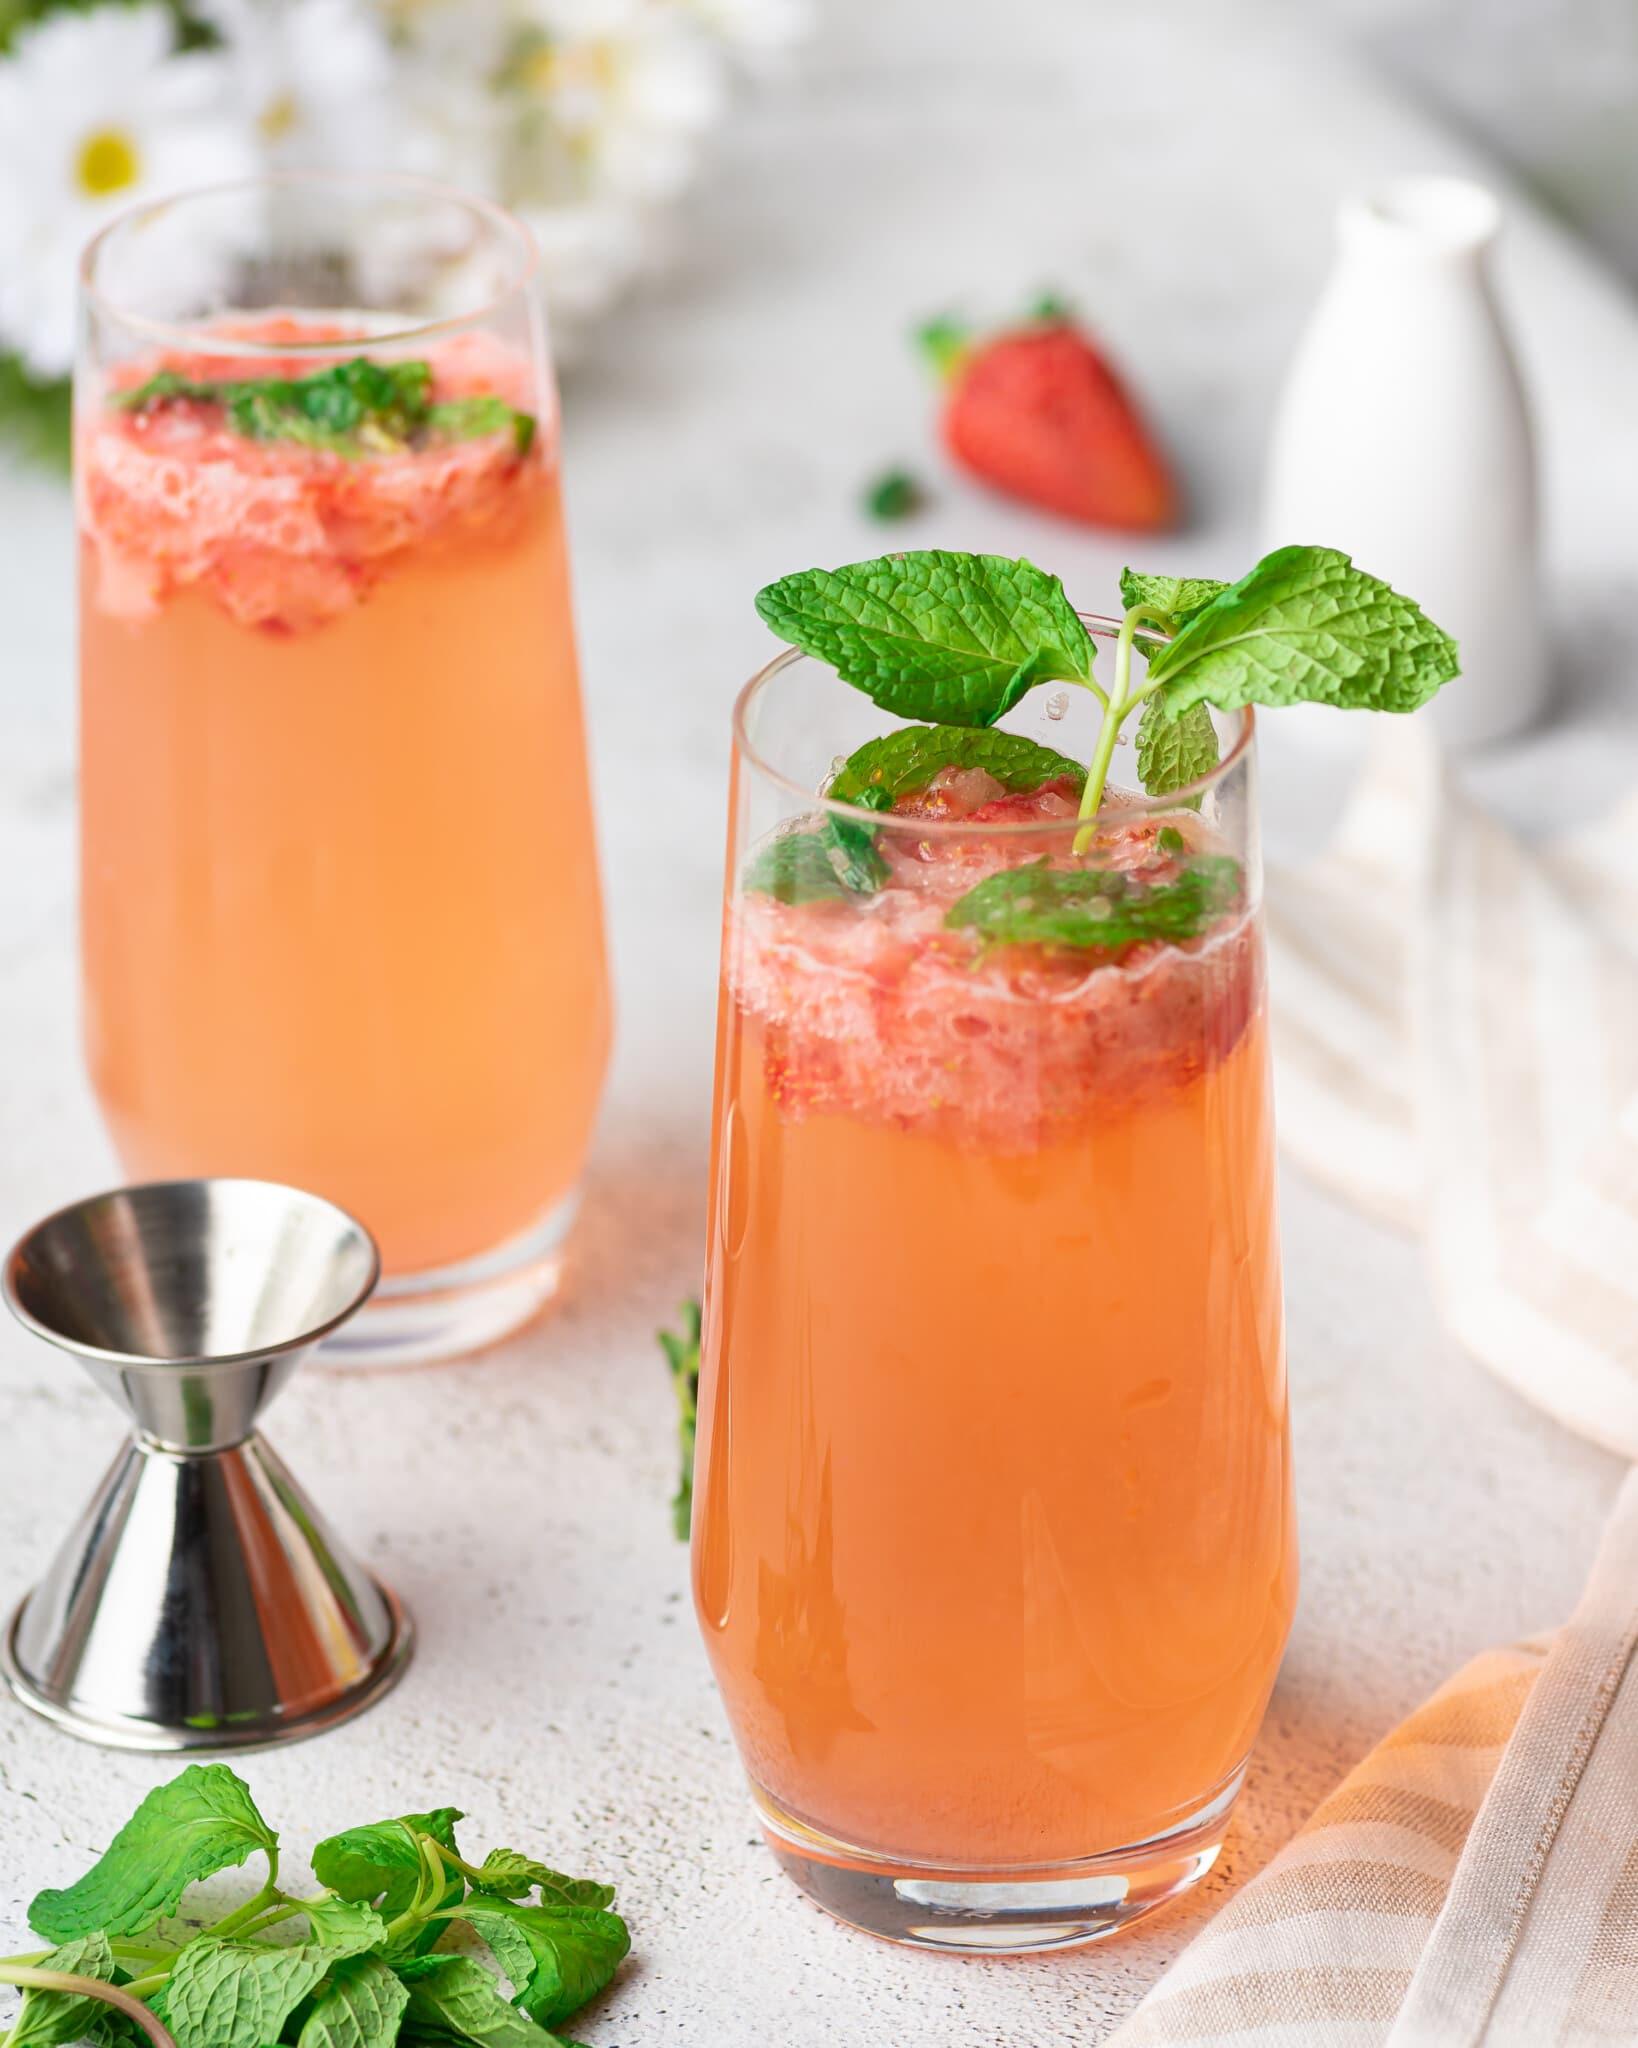 A glass of strawberry mojito mocktail